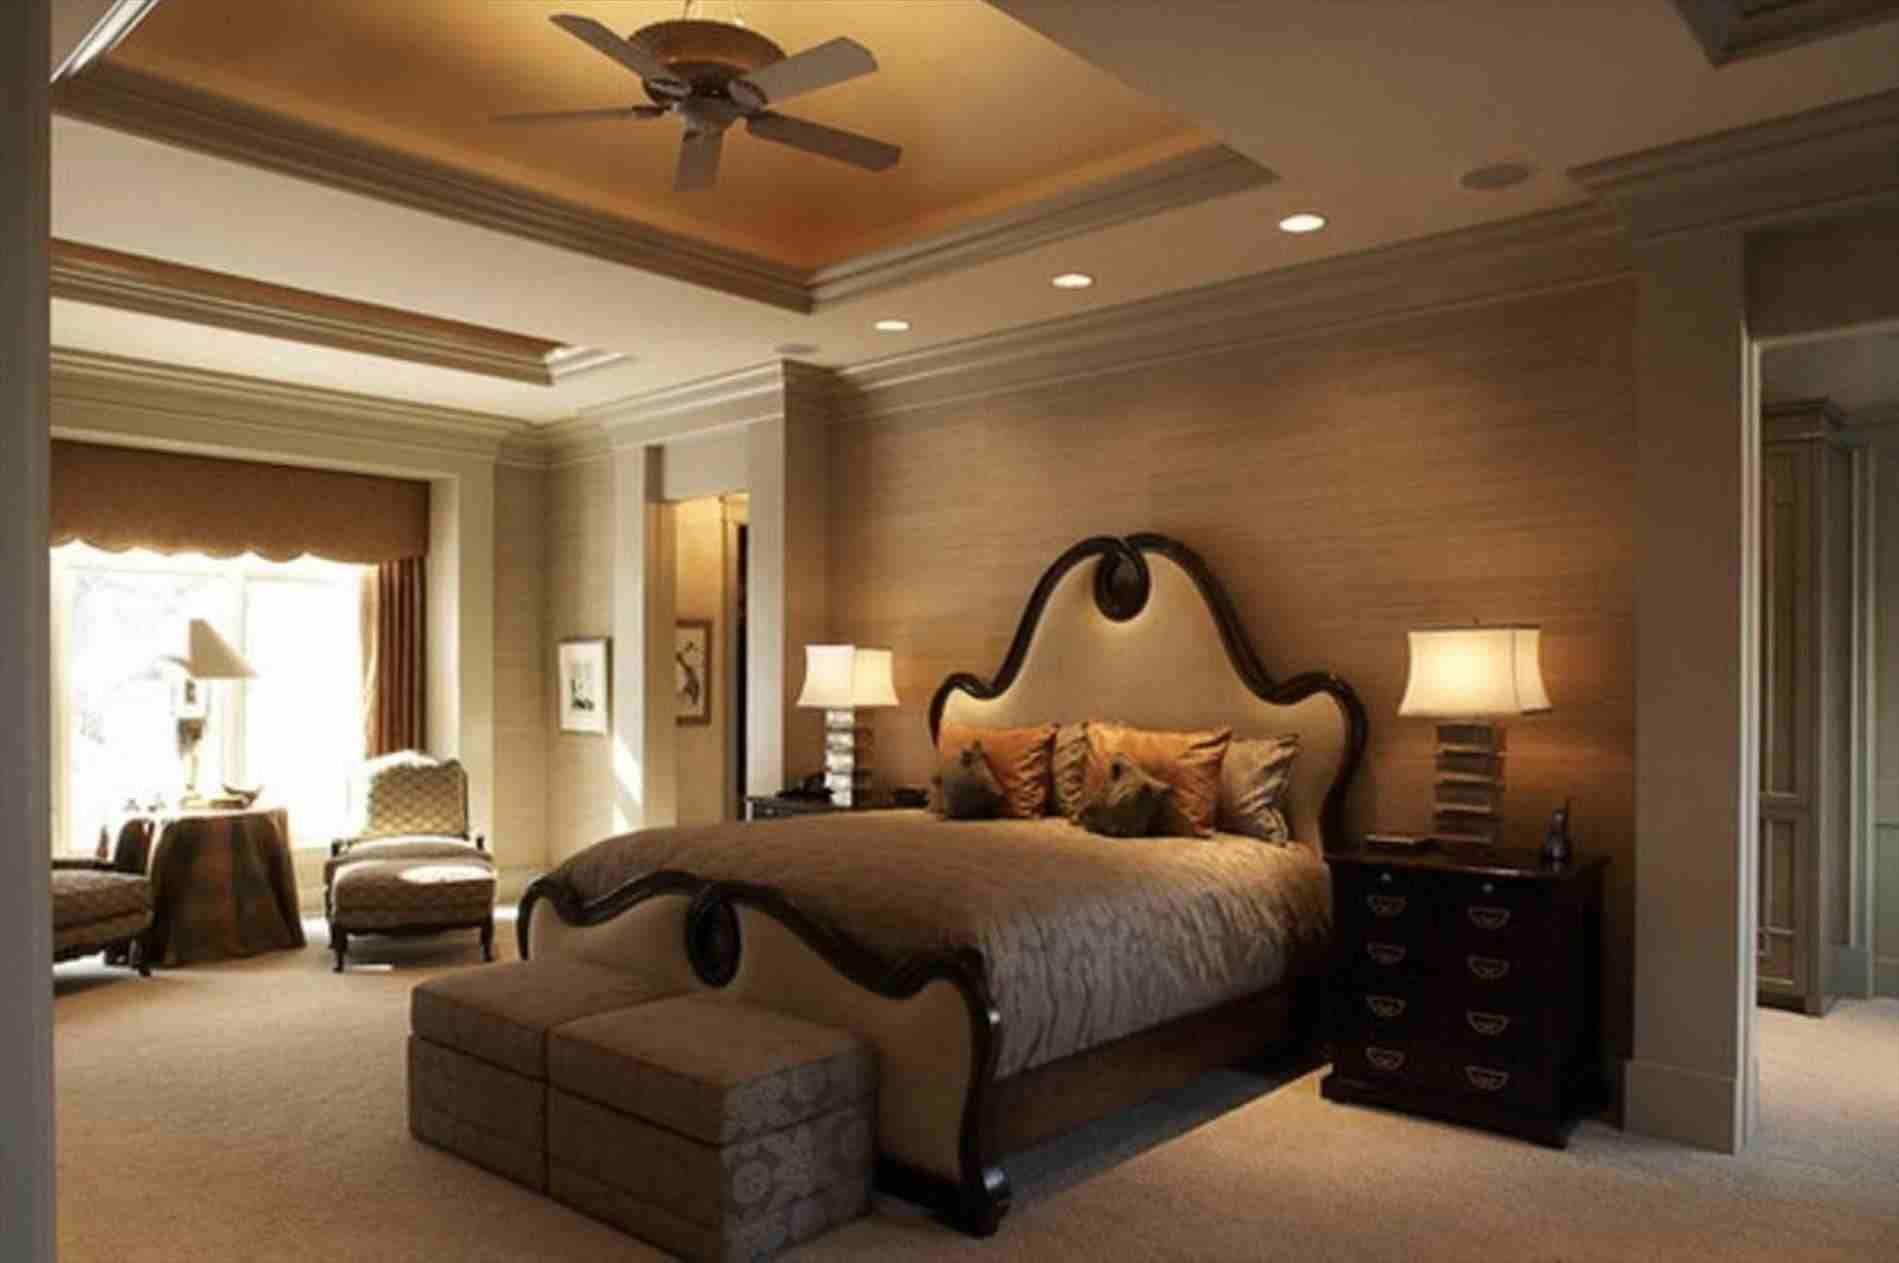 Pop Designs For Master Bedroom Ceiling Pop Ceiling Bedrooms Design Decorations Interior Ceiling Design Bedroom French Bedroom Design Eclectic Bedroom Design